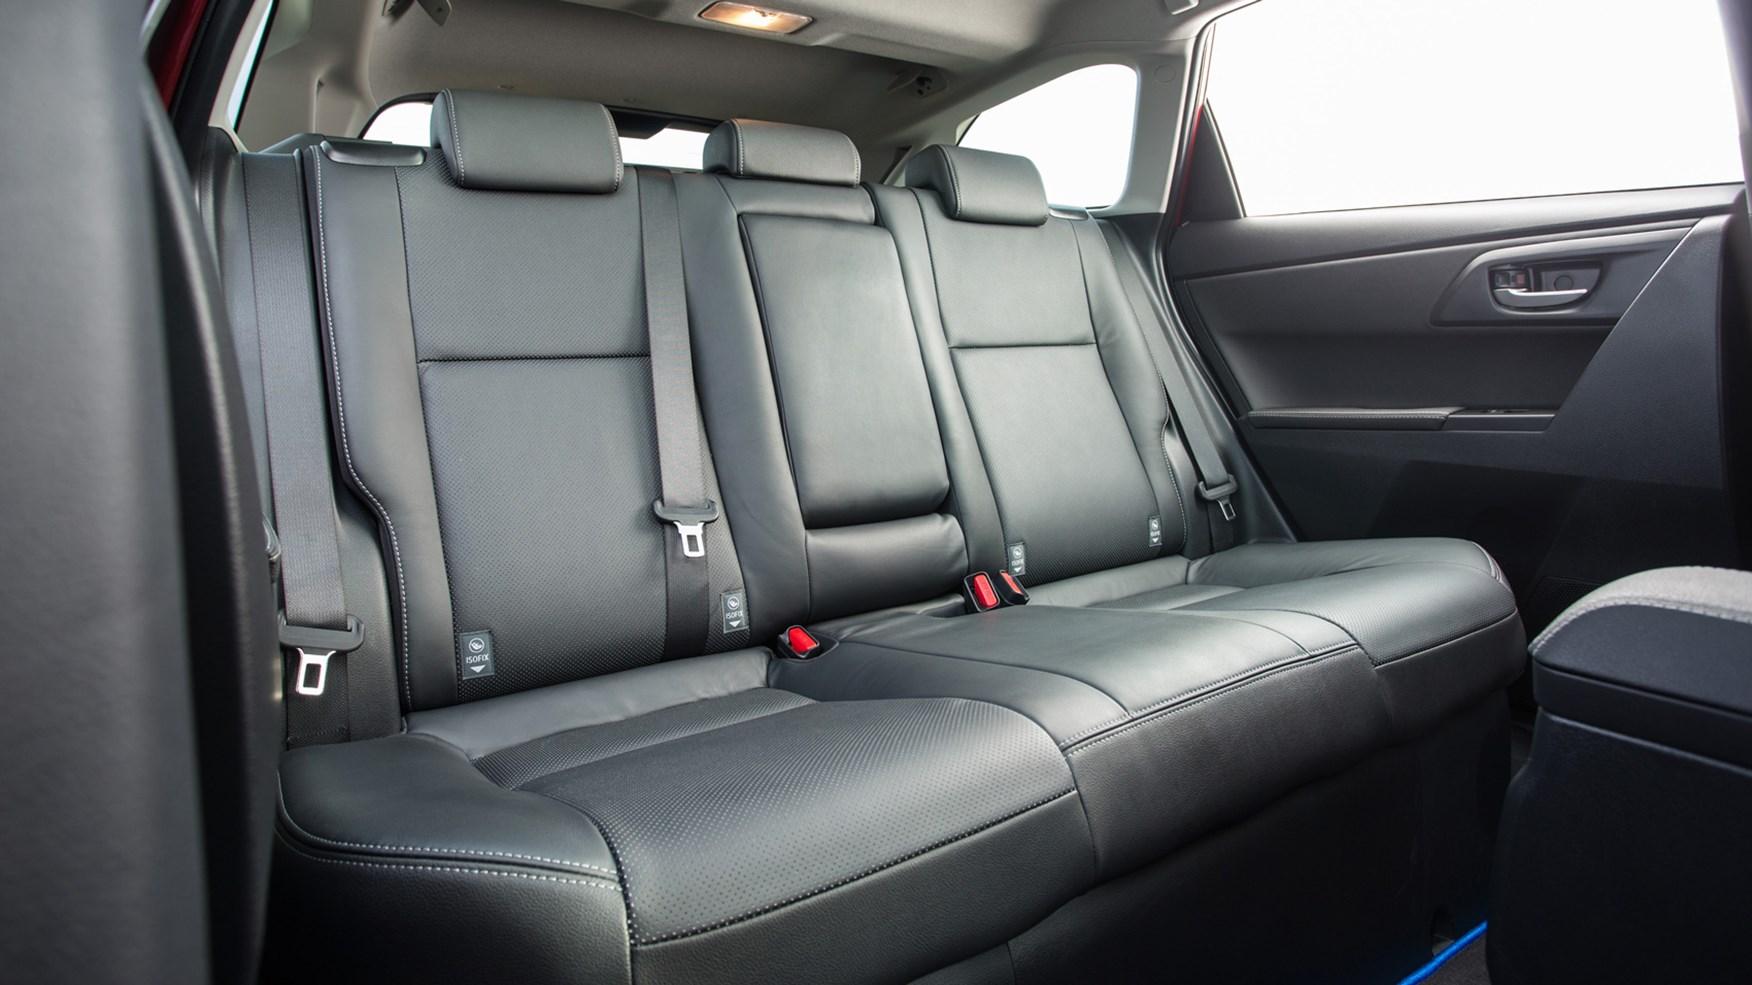 Toyota Station Wagon >> Toyota Auris Hybrid Touring Sports (2017) review by CAR Magazine